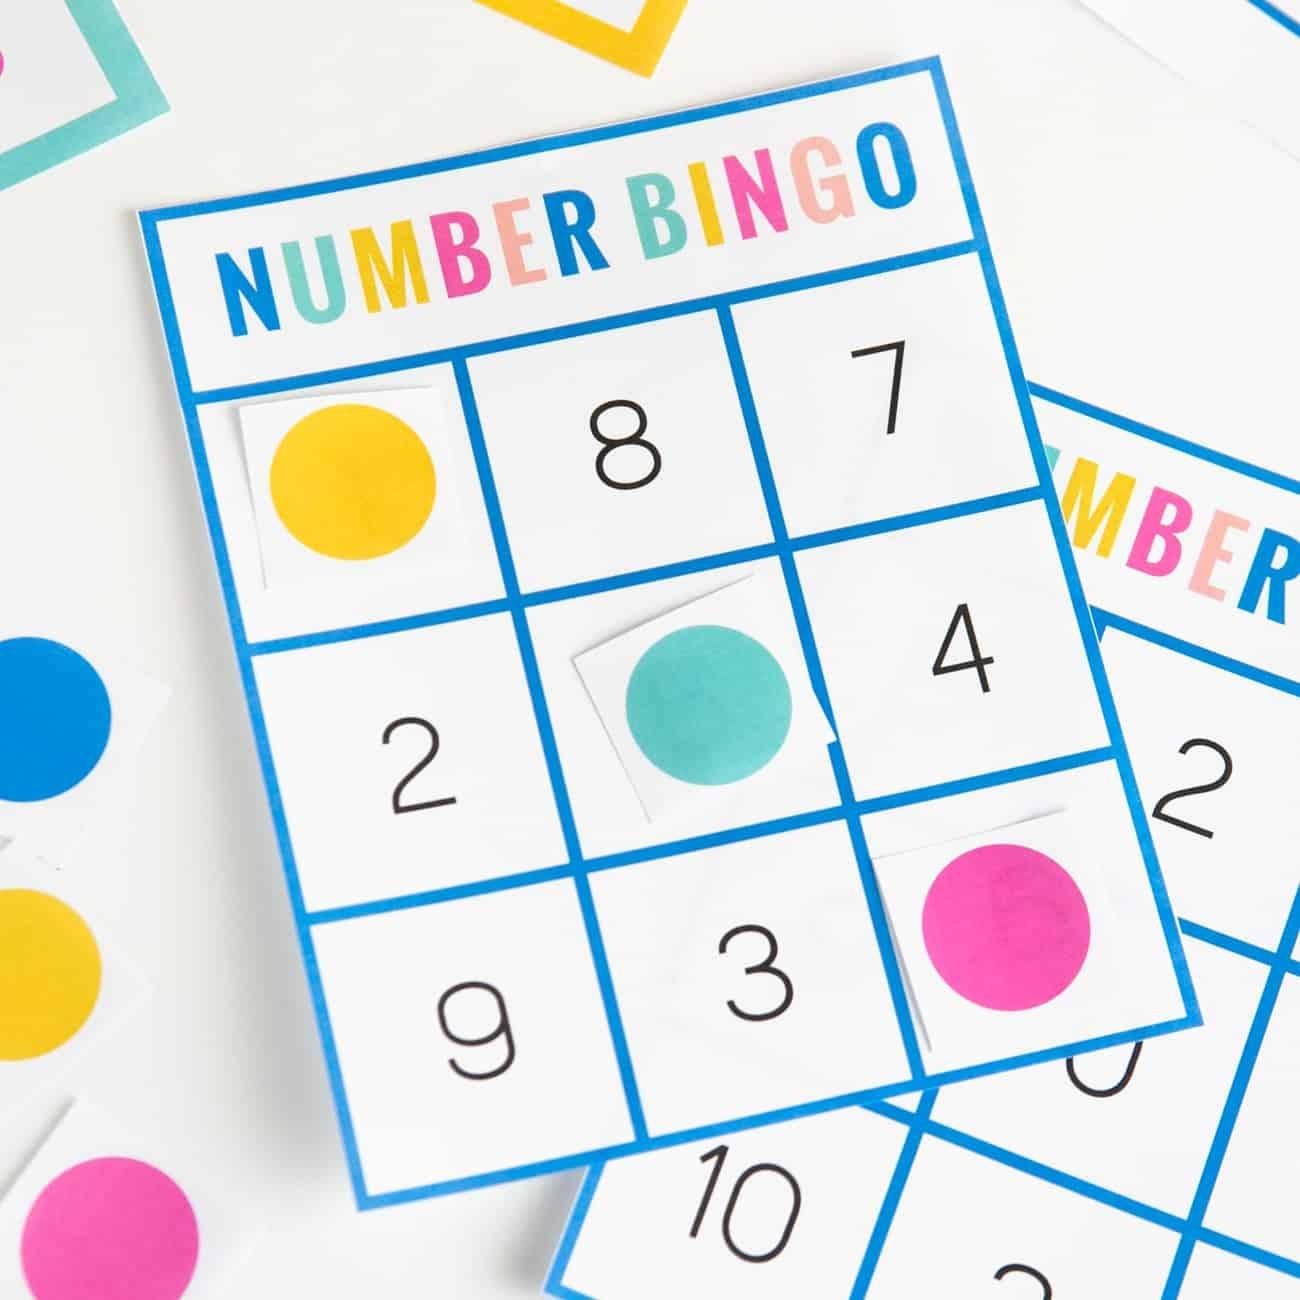 Free Printable Number Bingo - Design Eat Repeat - Free Printable Bingo Chips